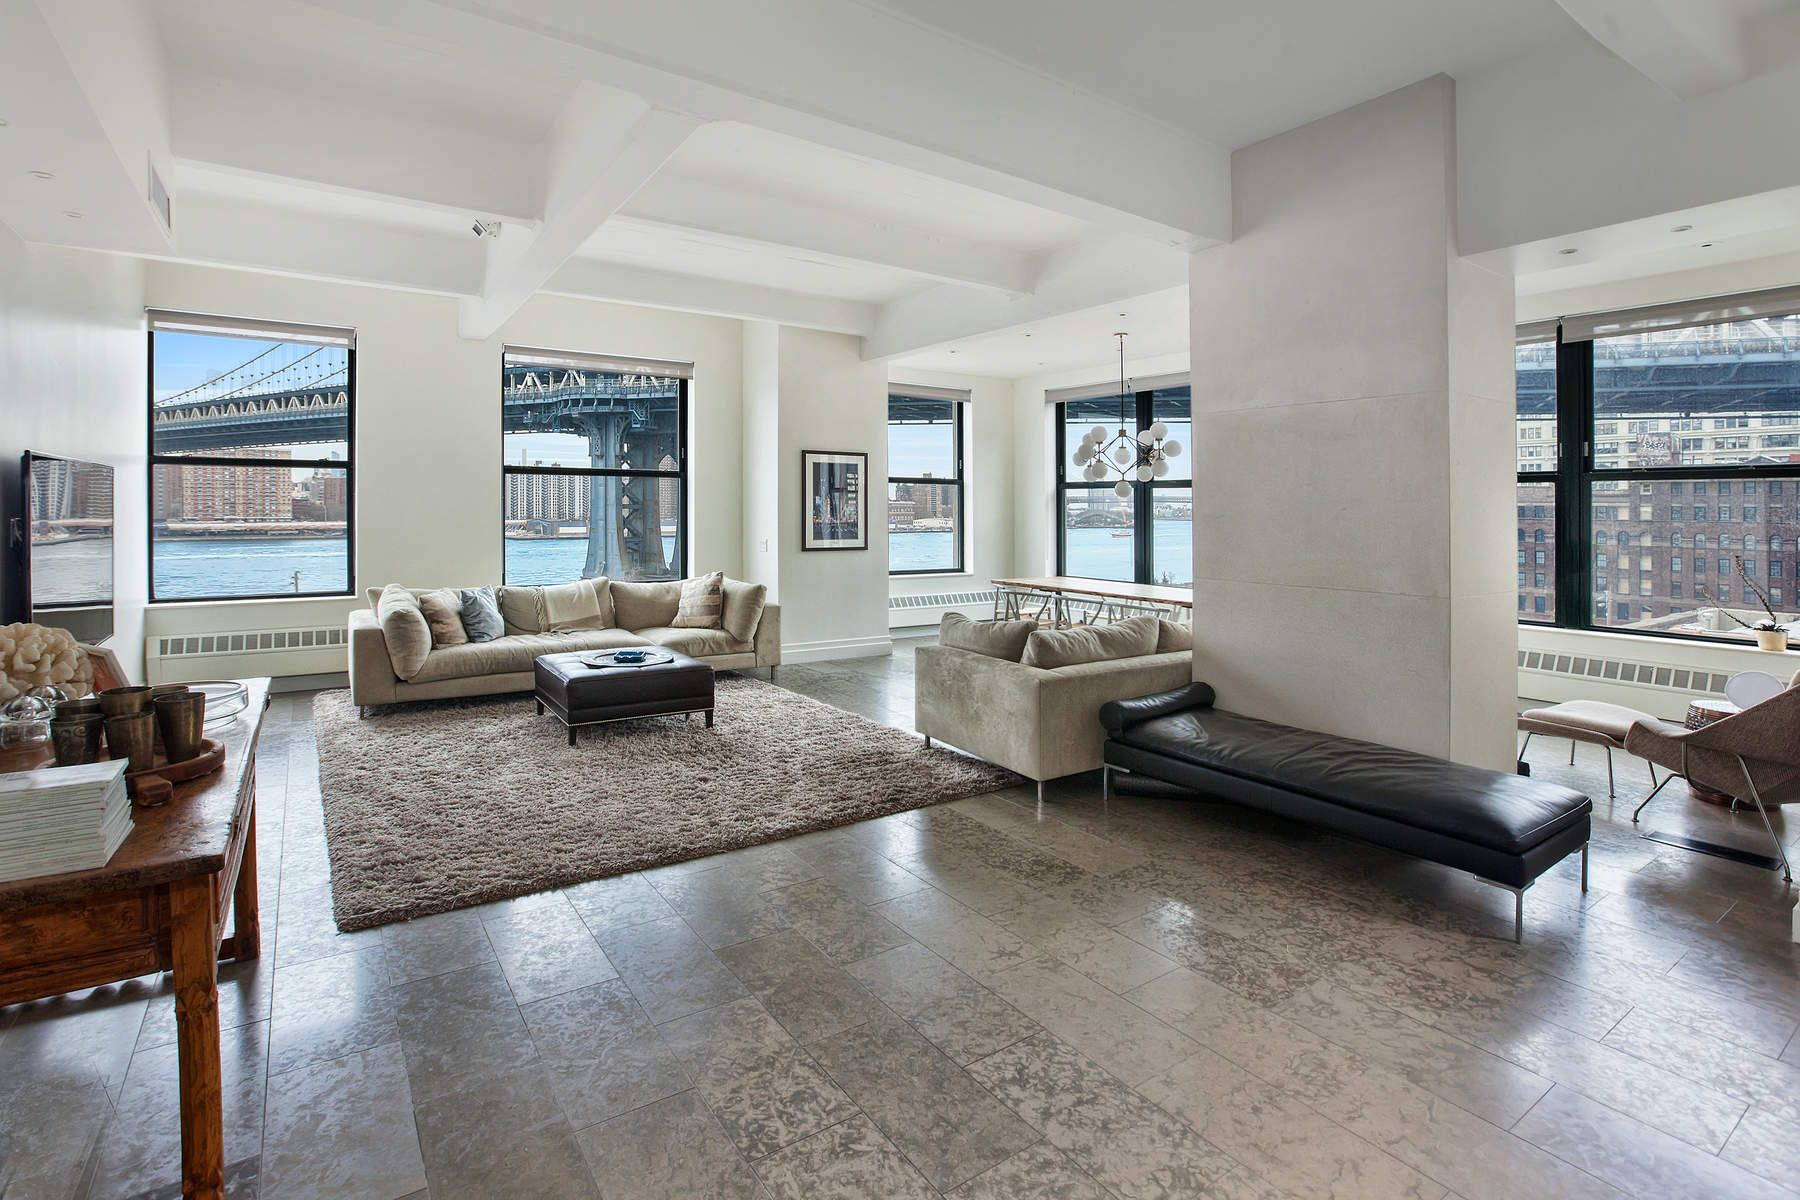 Condominium for Sale at Spacious, Renovated Waterfront Loft 1 Main Street Apt 5D Brooklyn, New York 11201 United States